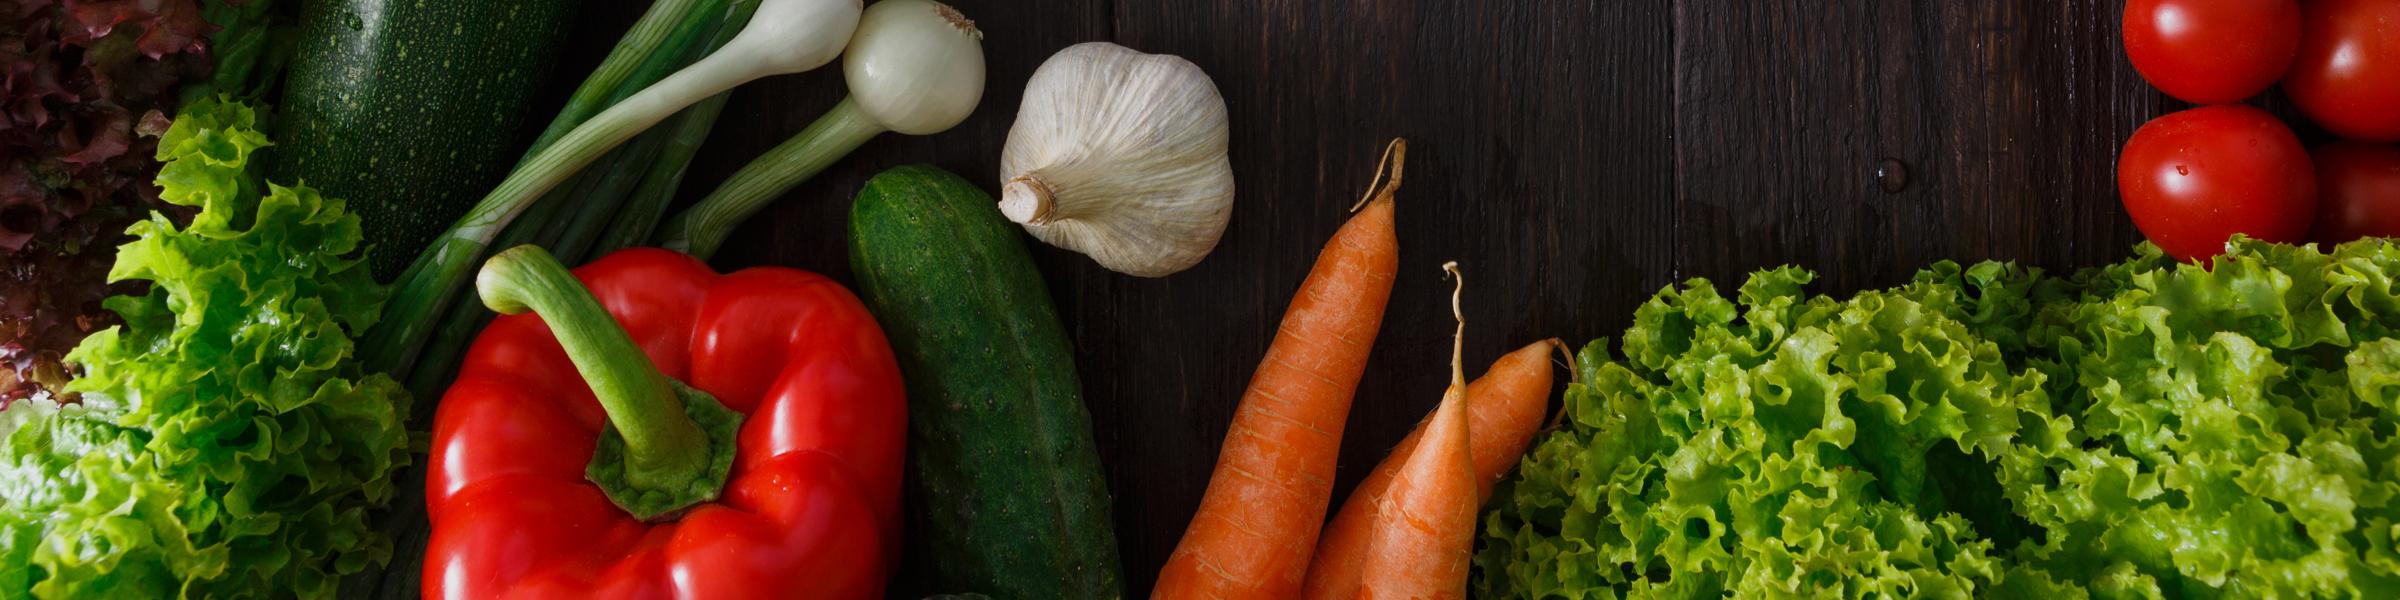 Arrangement of vegetables on a wooden background.